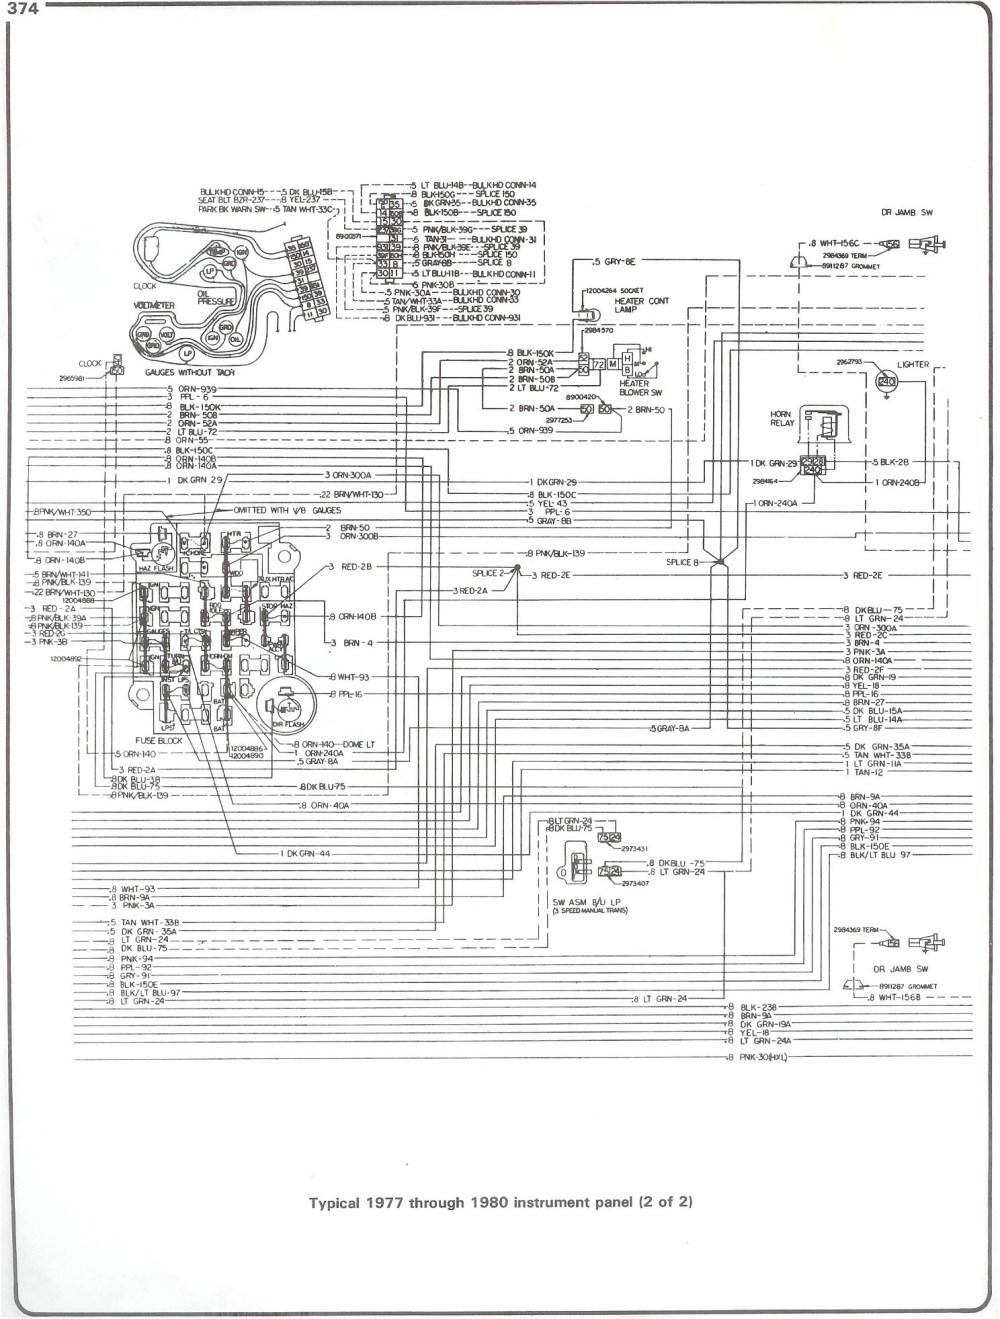 medium resolution of 77 80 instrument pg2 with 78 chevy truck wiring diagram wiring diagram chevy starter solenoid wiring freightliner